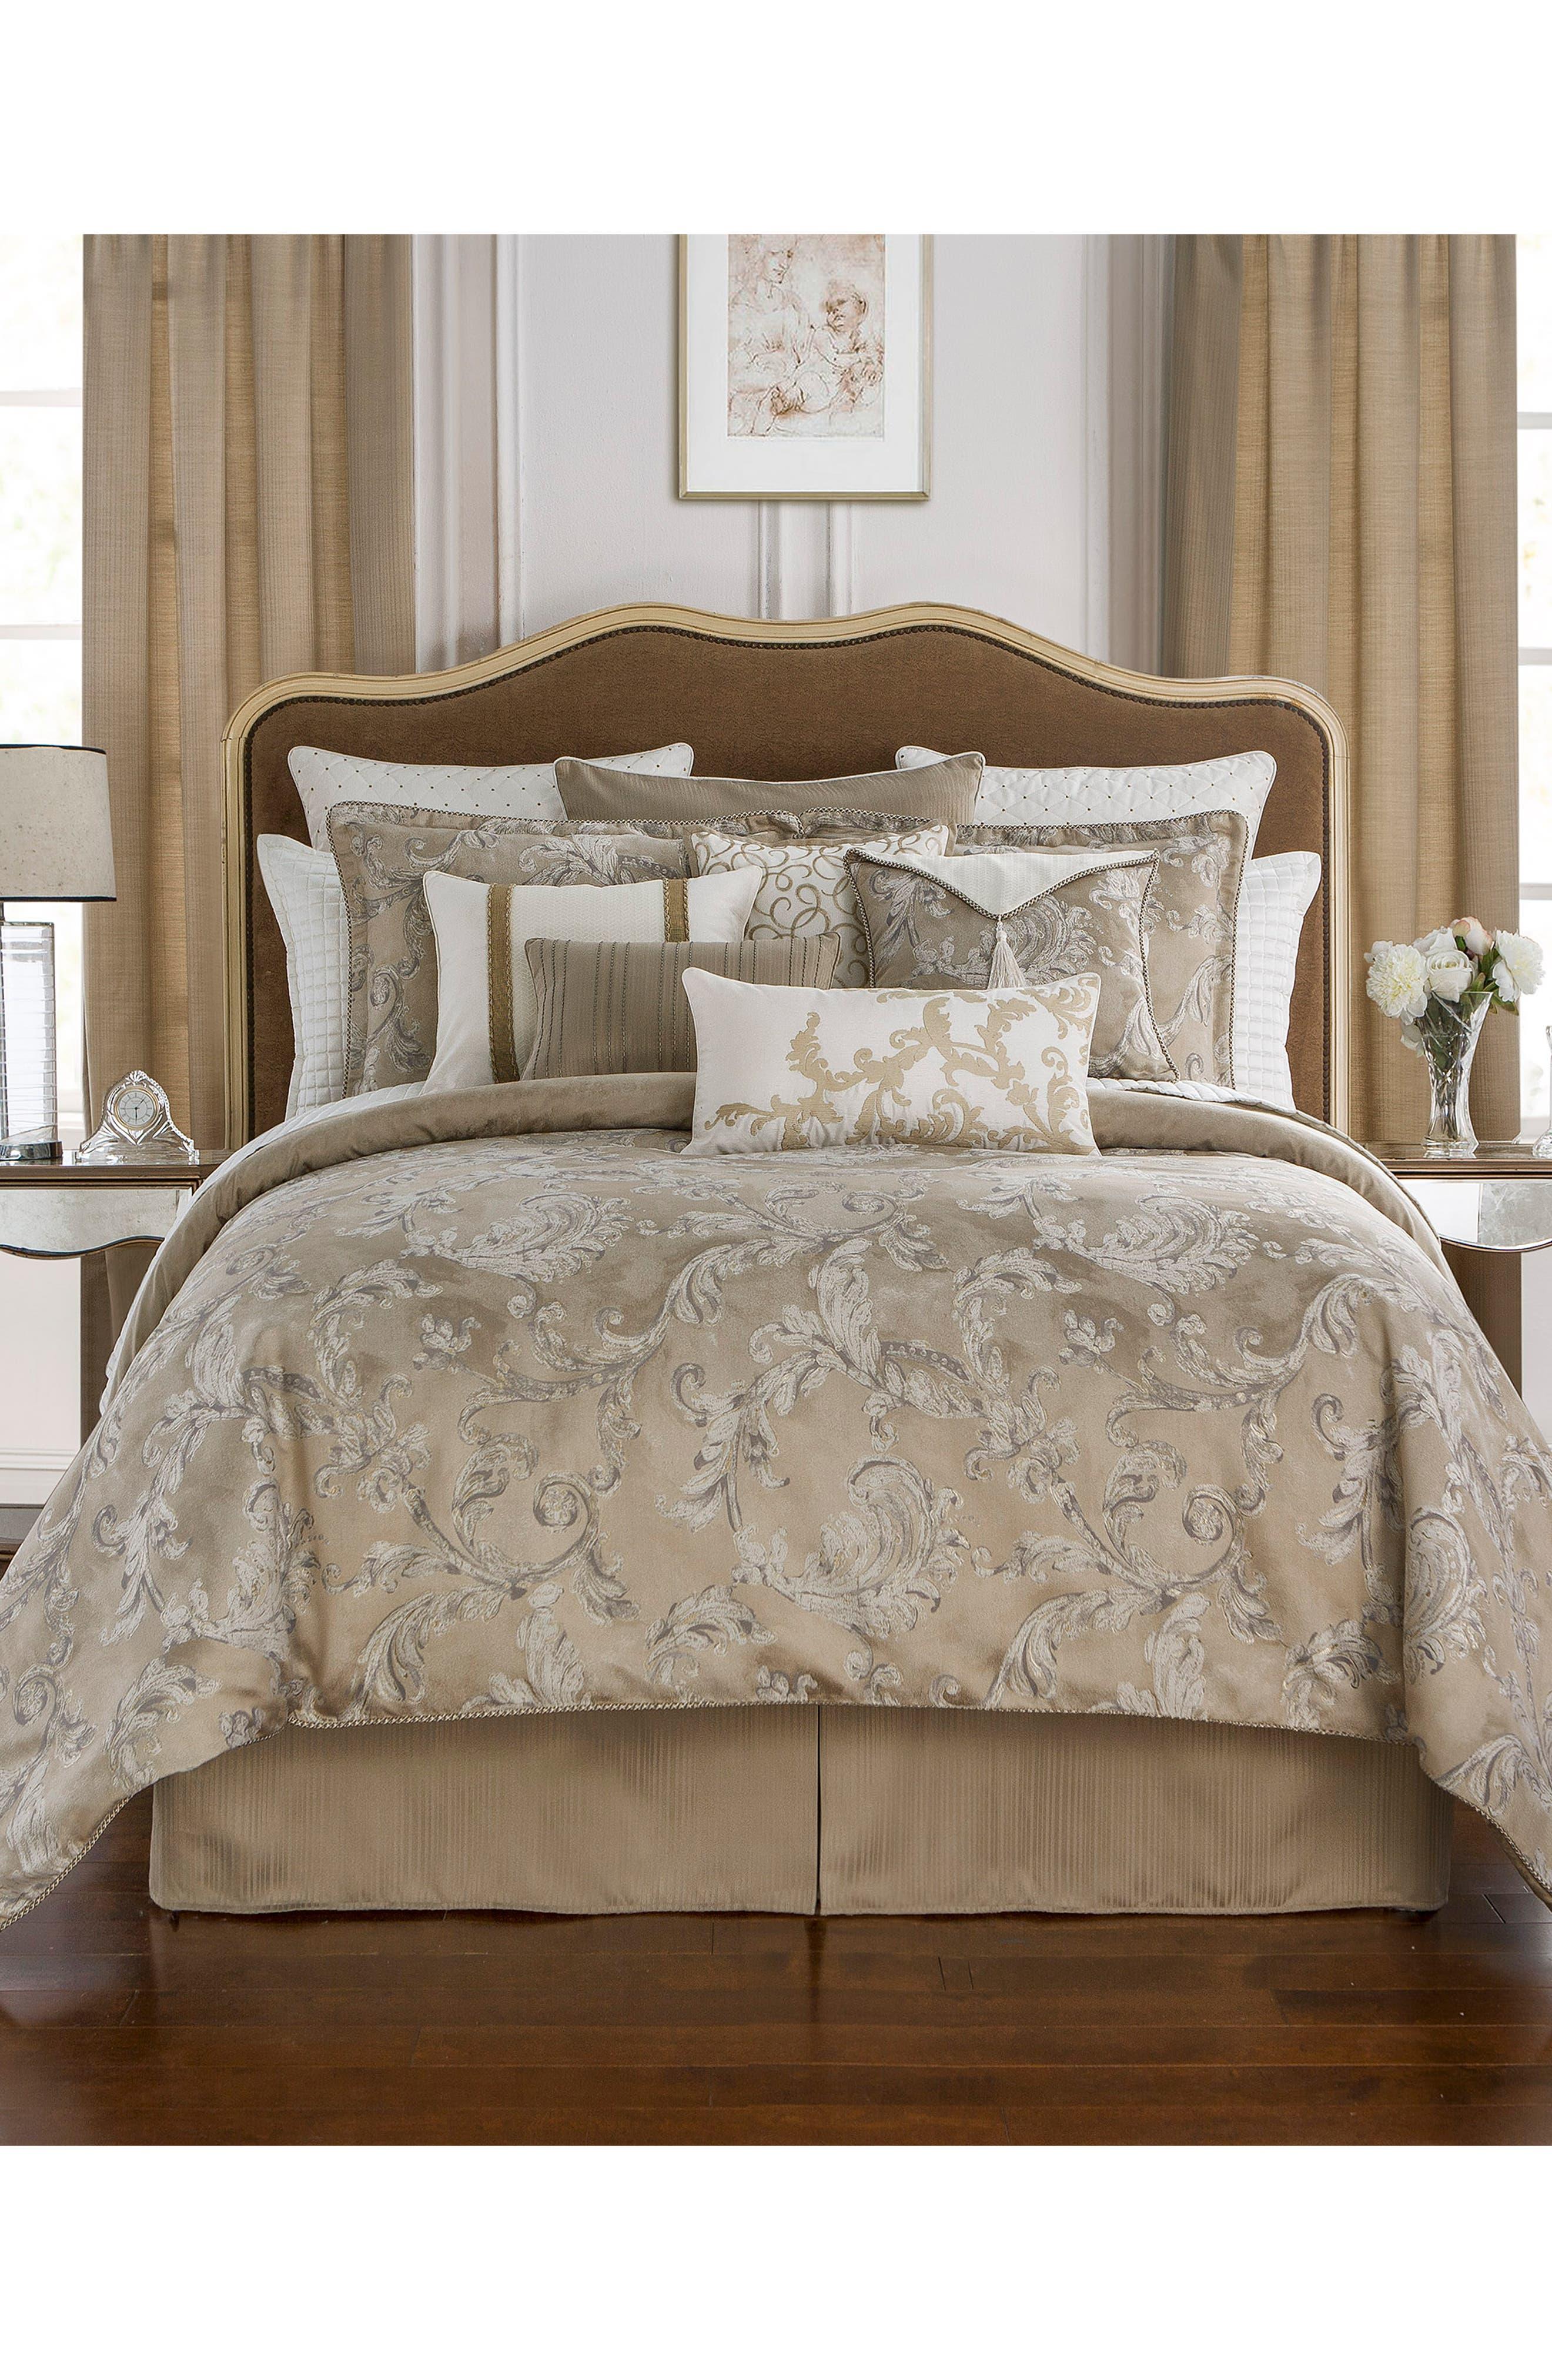 Chantelle Reversible Comforter, Sham & Bed Skirt Set,                             Main thumbnail 1, color,                             TAUPE